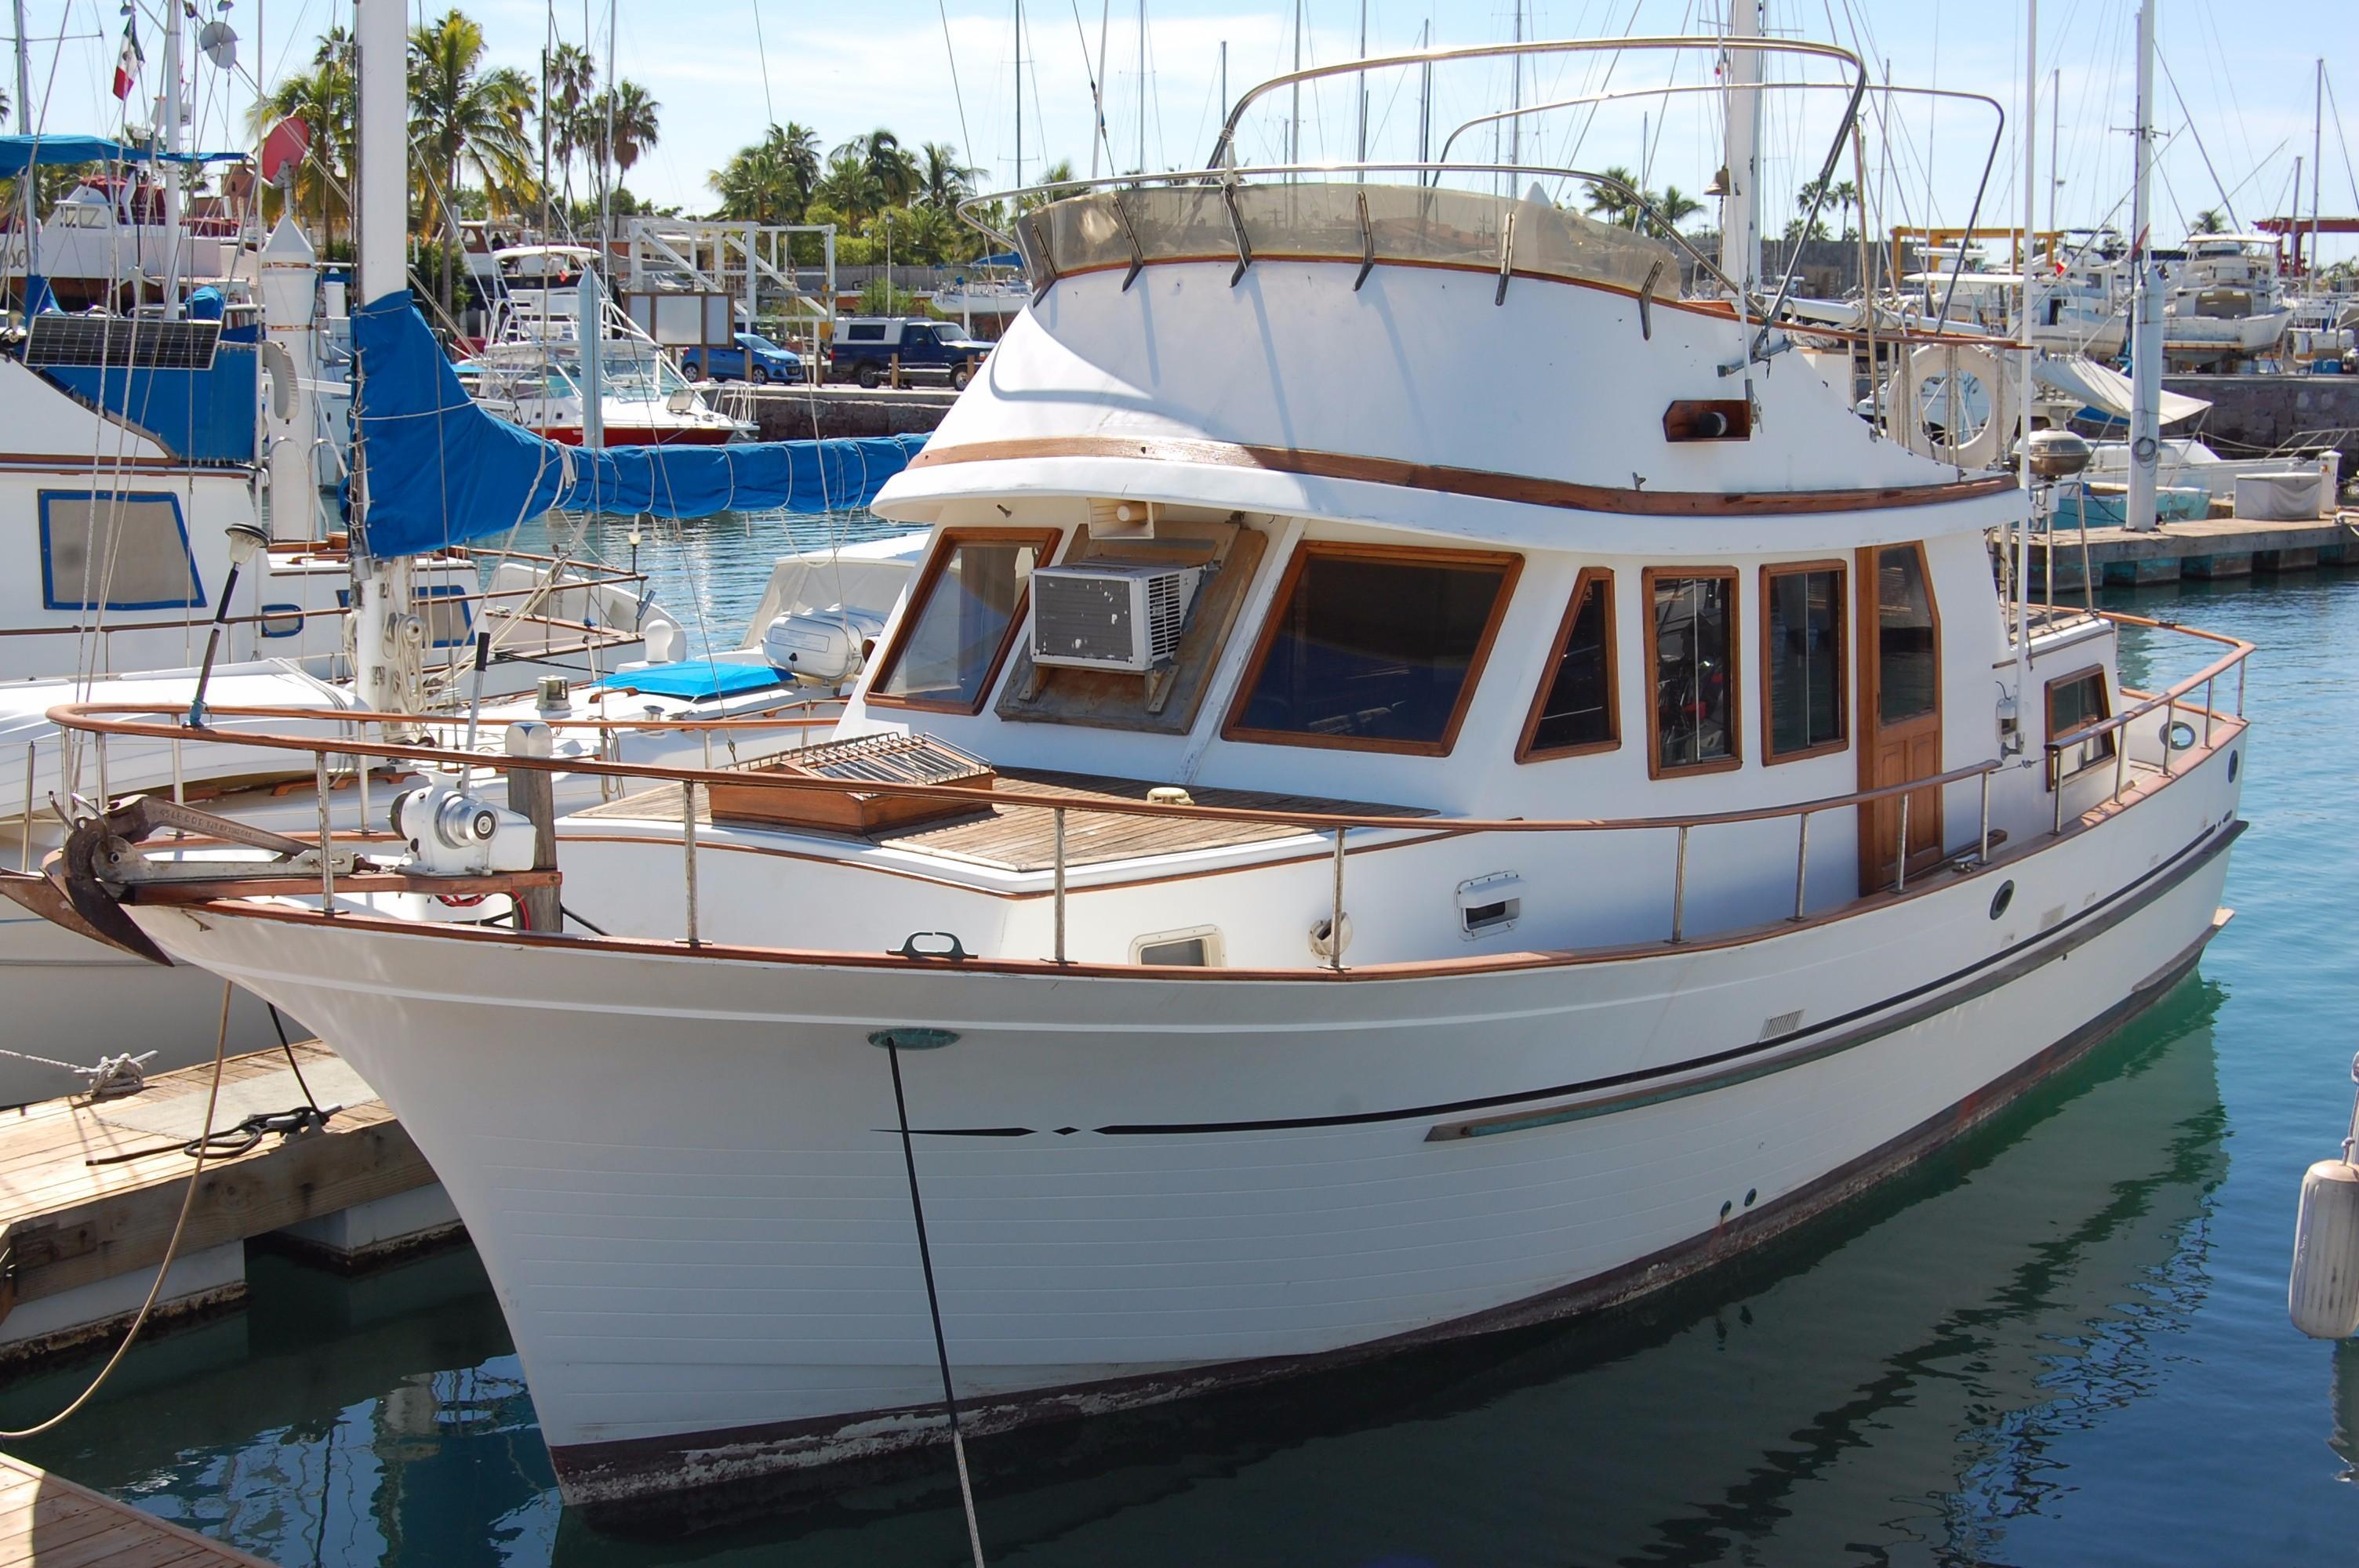 40' Hershine Trawler+Boat for sale!